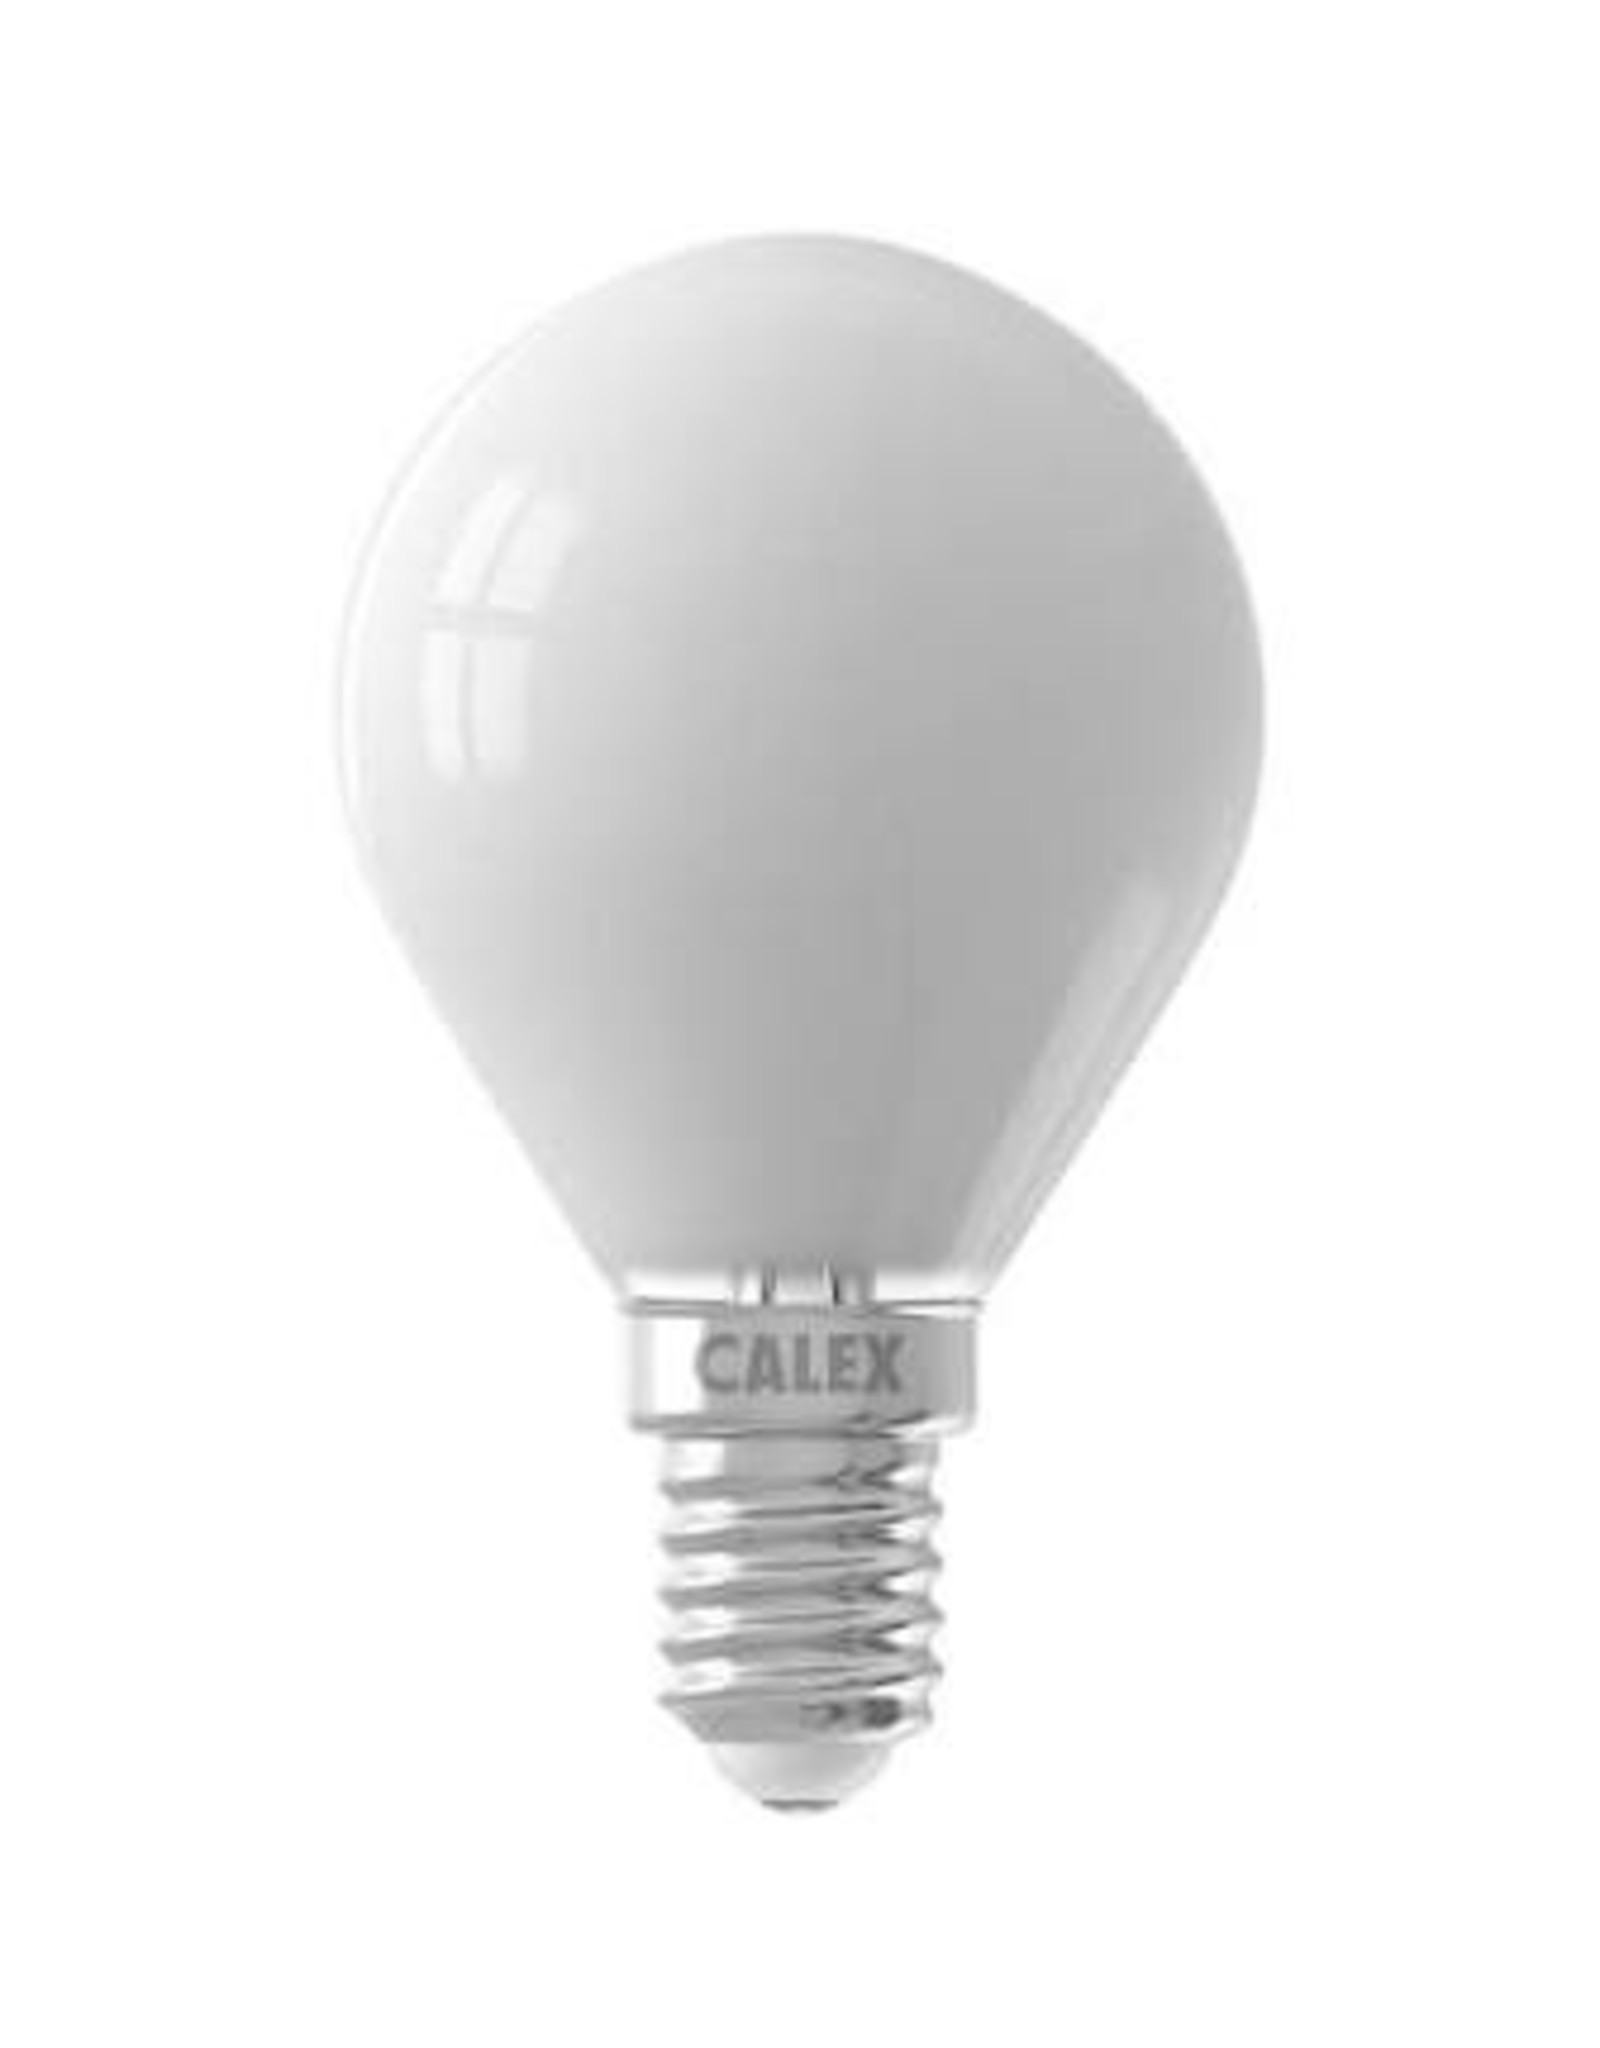 Calex LED Full Glass Filament Ball-lamp 220-240V 3,5W 350lm E14 P45, Softline 2700K CRI80 Dimmable, energy label A++